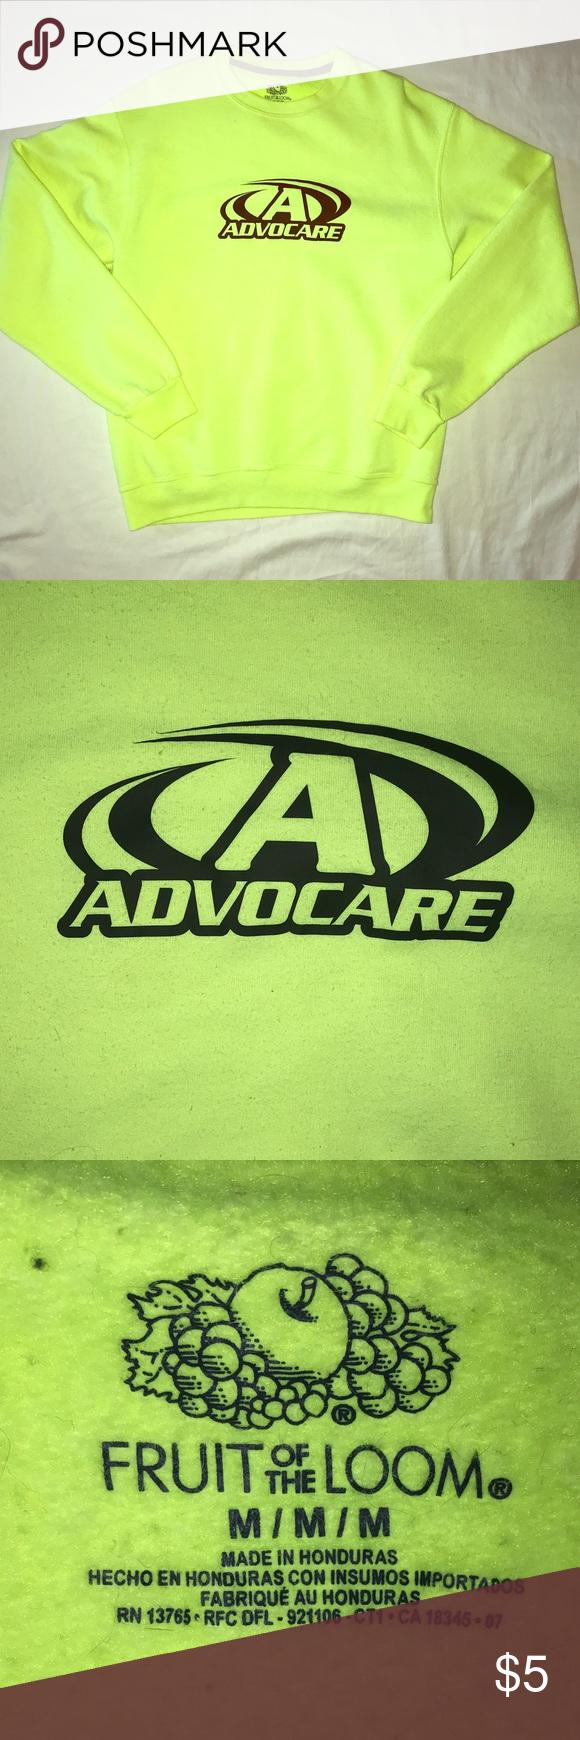 Advocare Sweatshirt Sweatshirts Sweatshirt Shirt Sweatshirts Hoodie